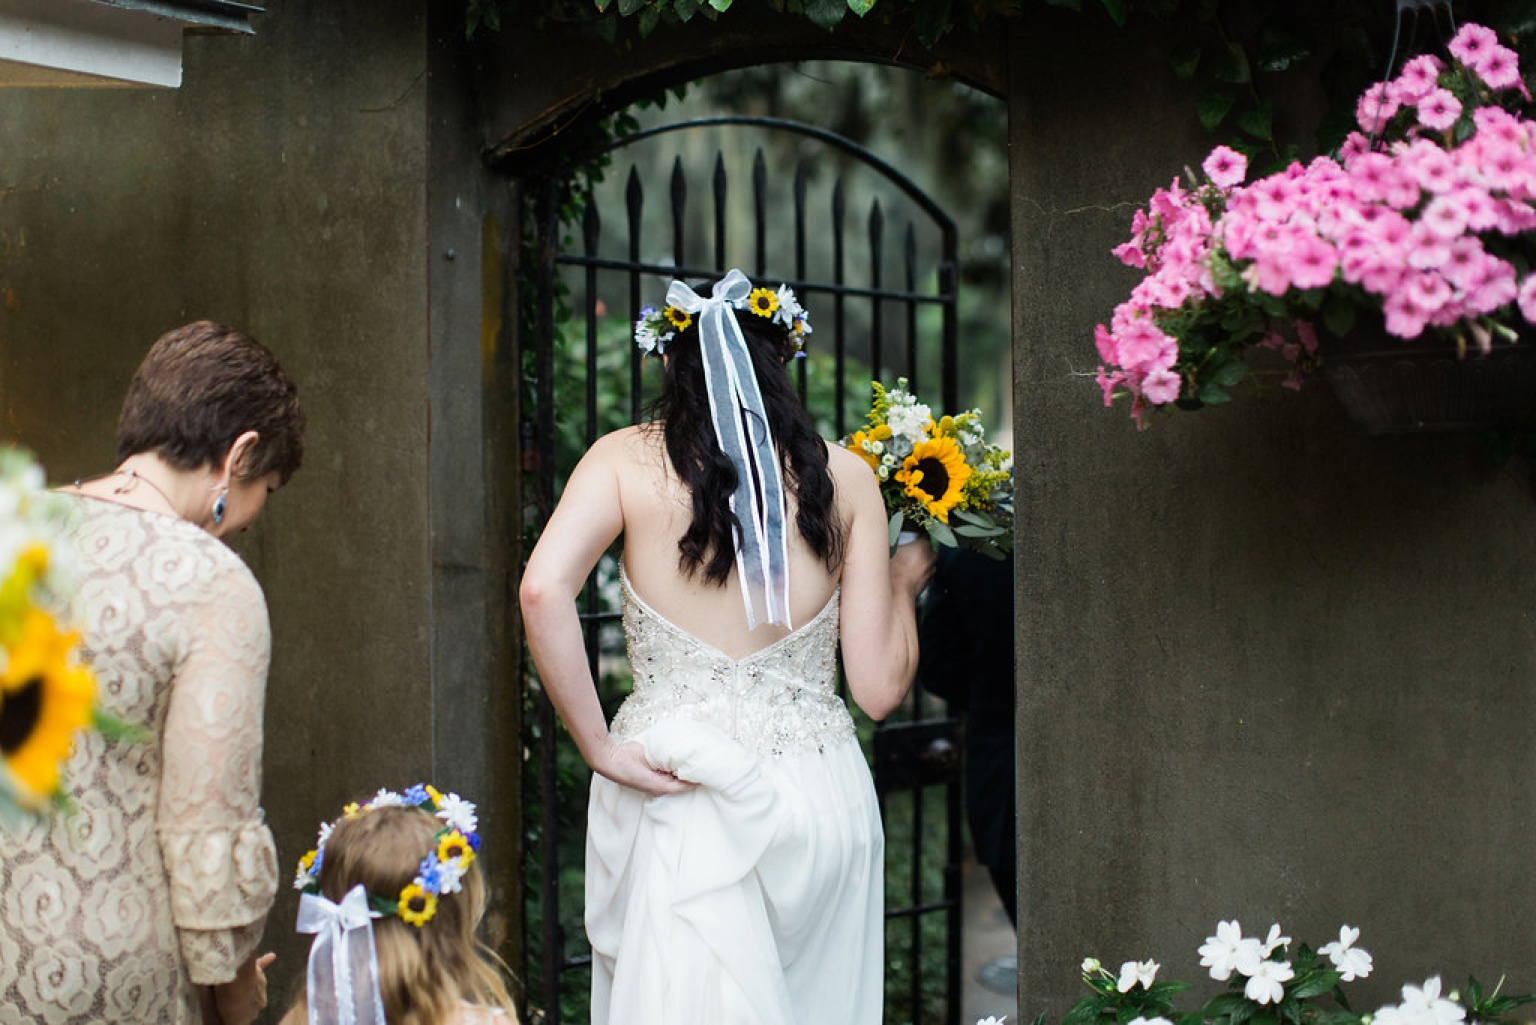 Apt_B_Photo_Savannah_Wedding_Photographer_Flower_Crown032.JPG